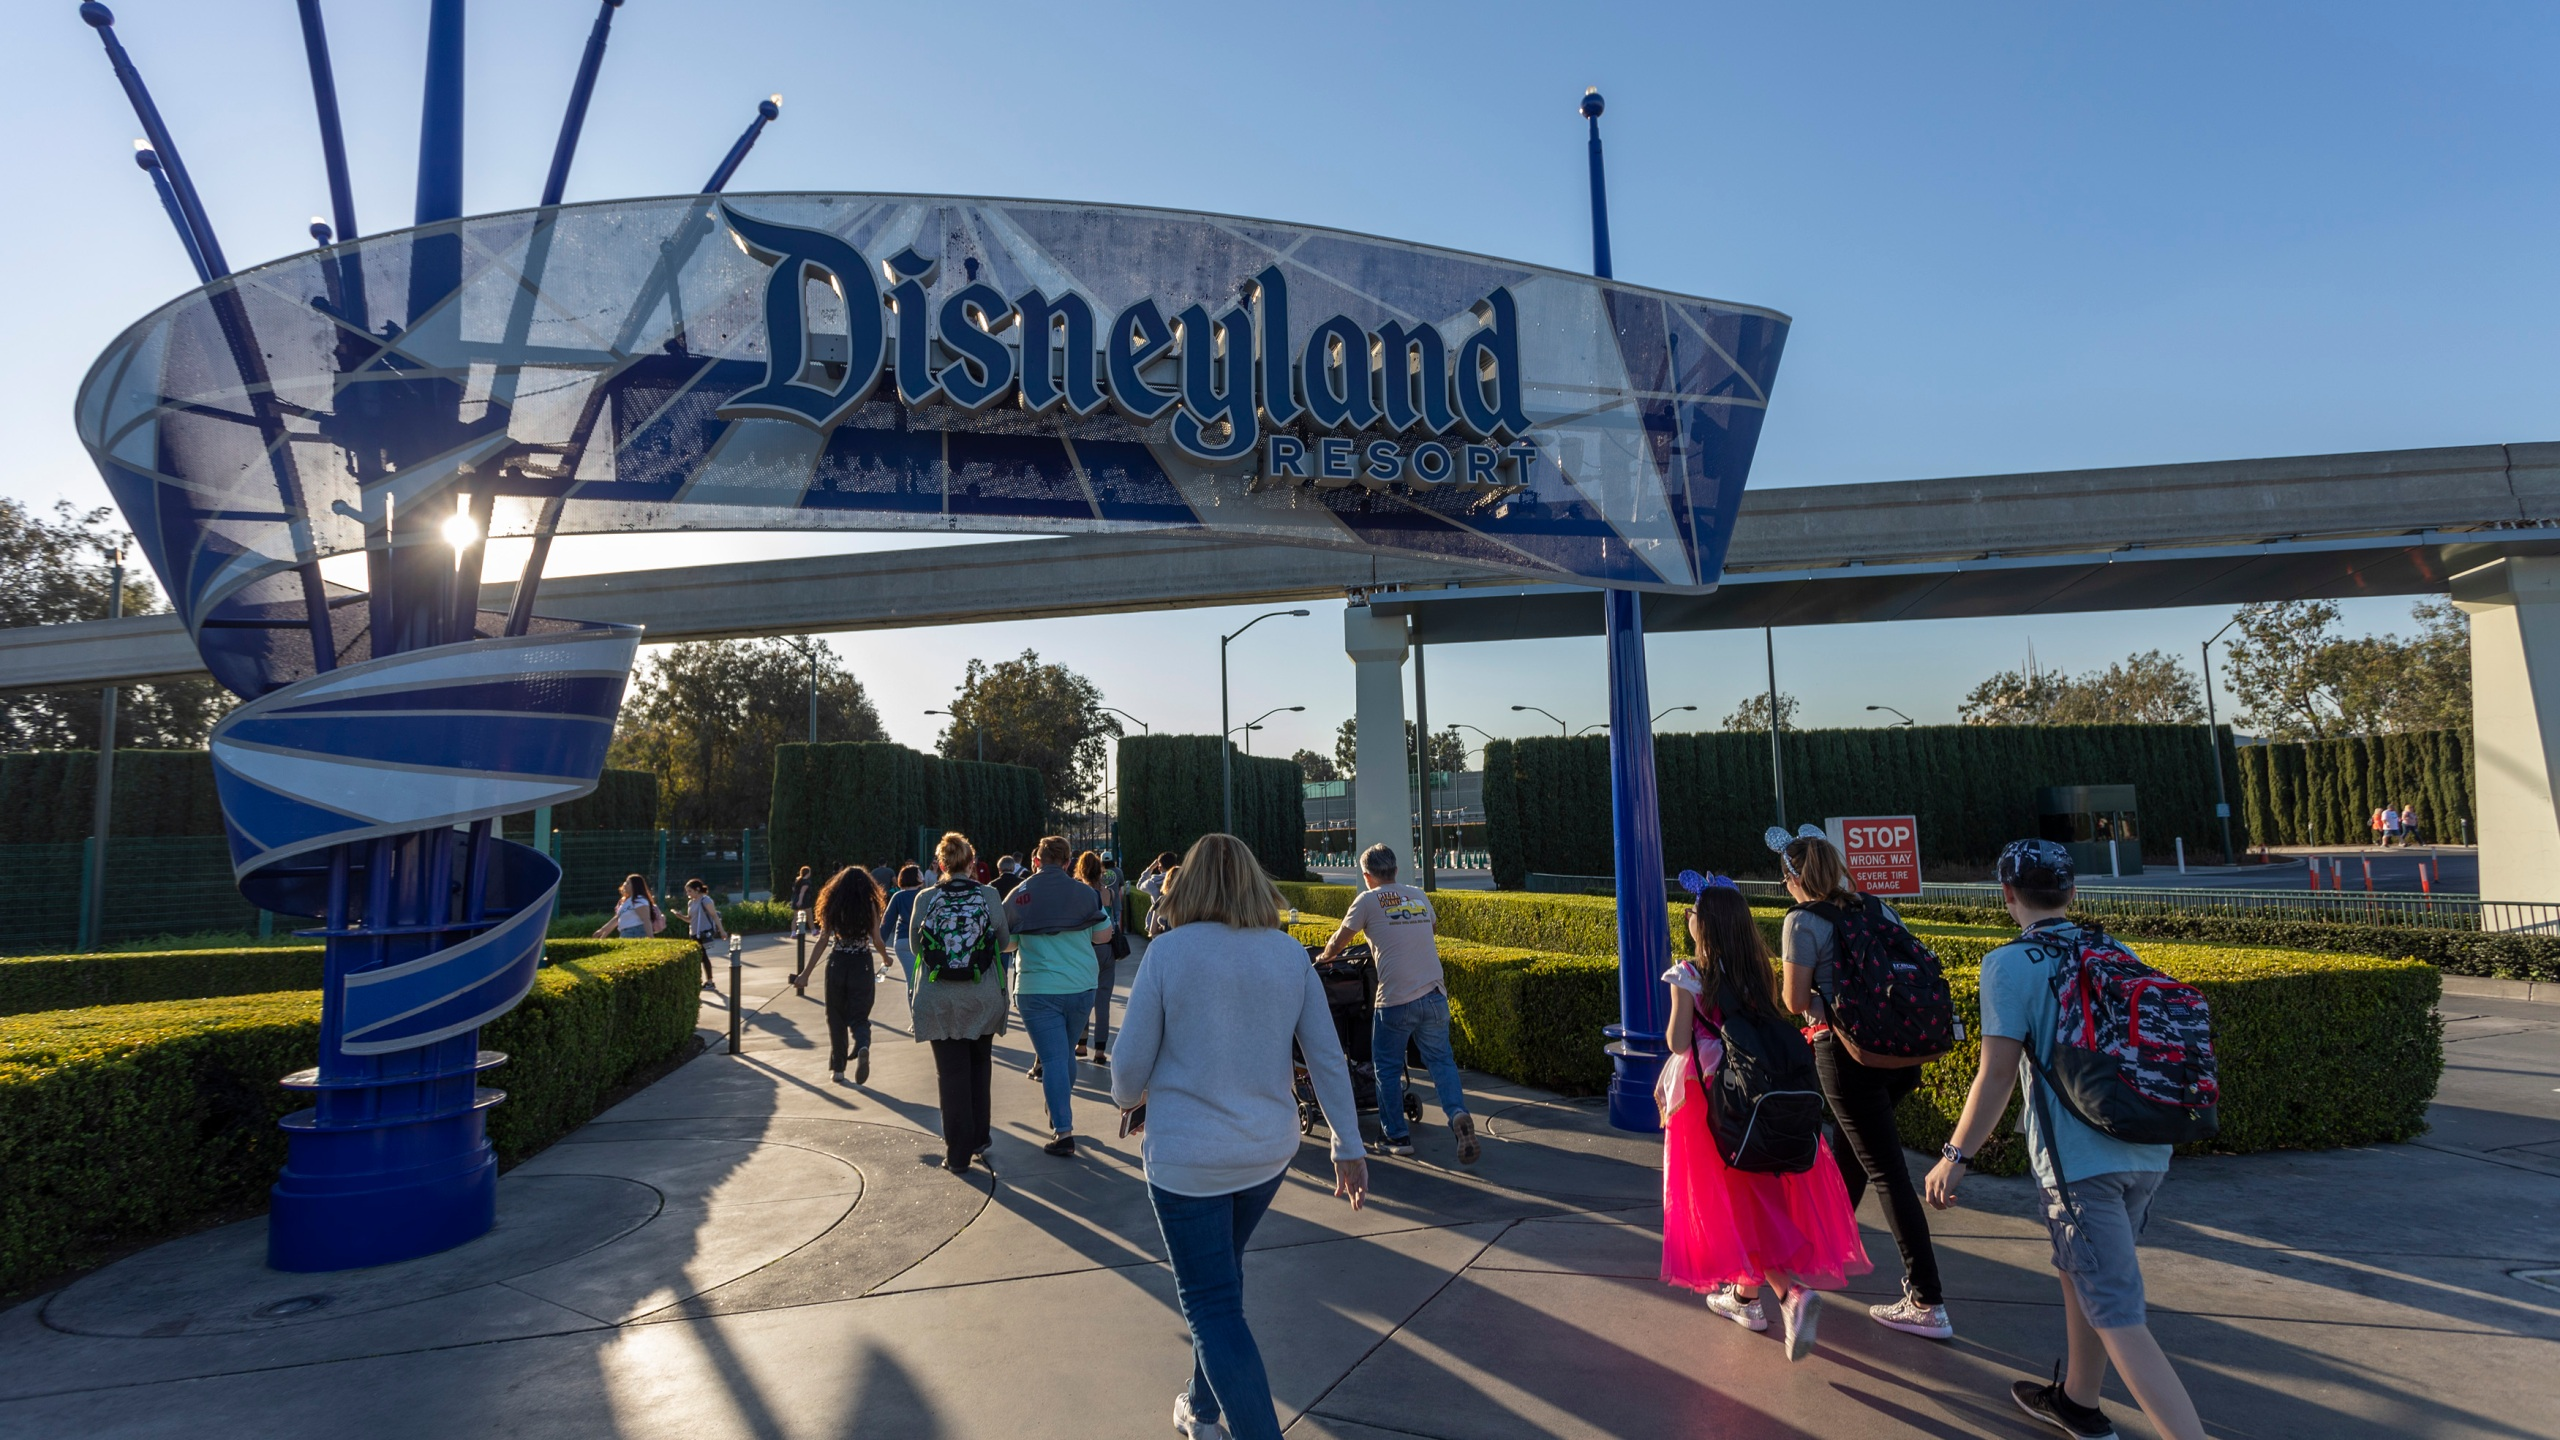 Visitors attend Disneyland Park on Feb. 25, 2020, in Anaheim. (David McNew/Getty Images)